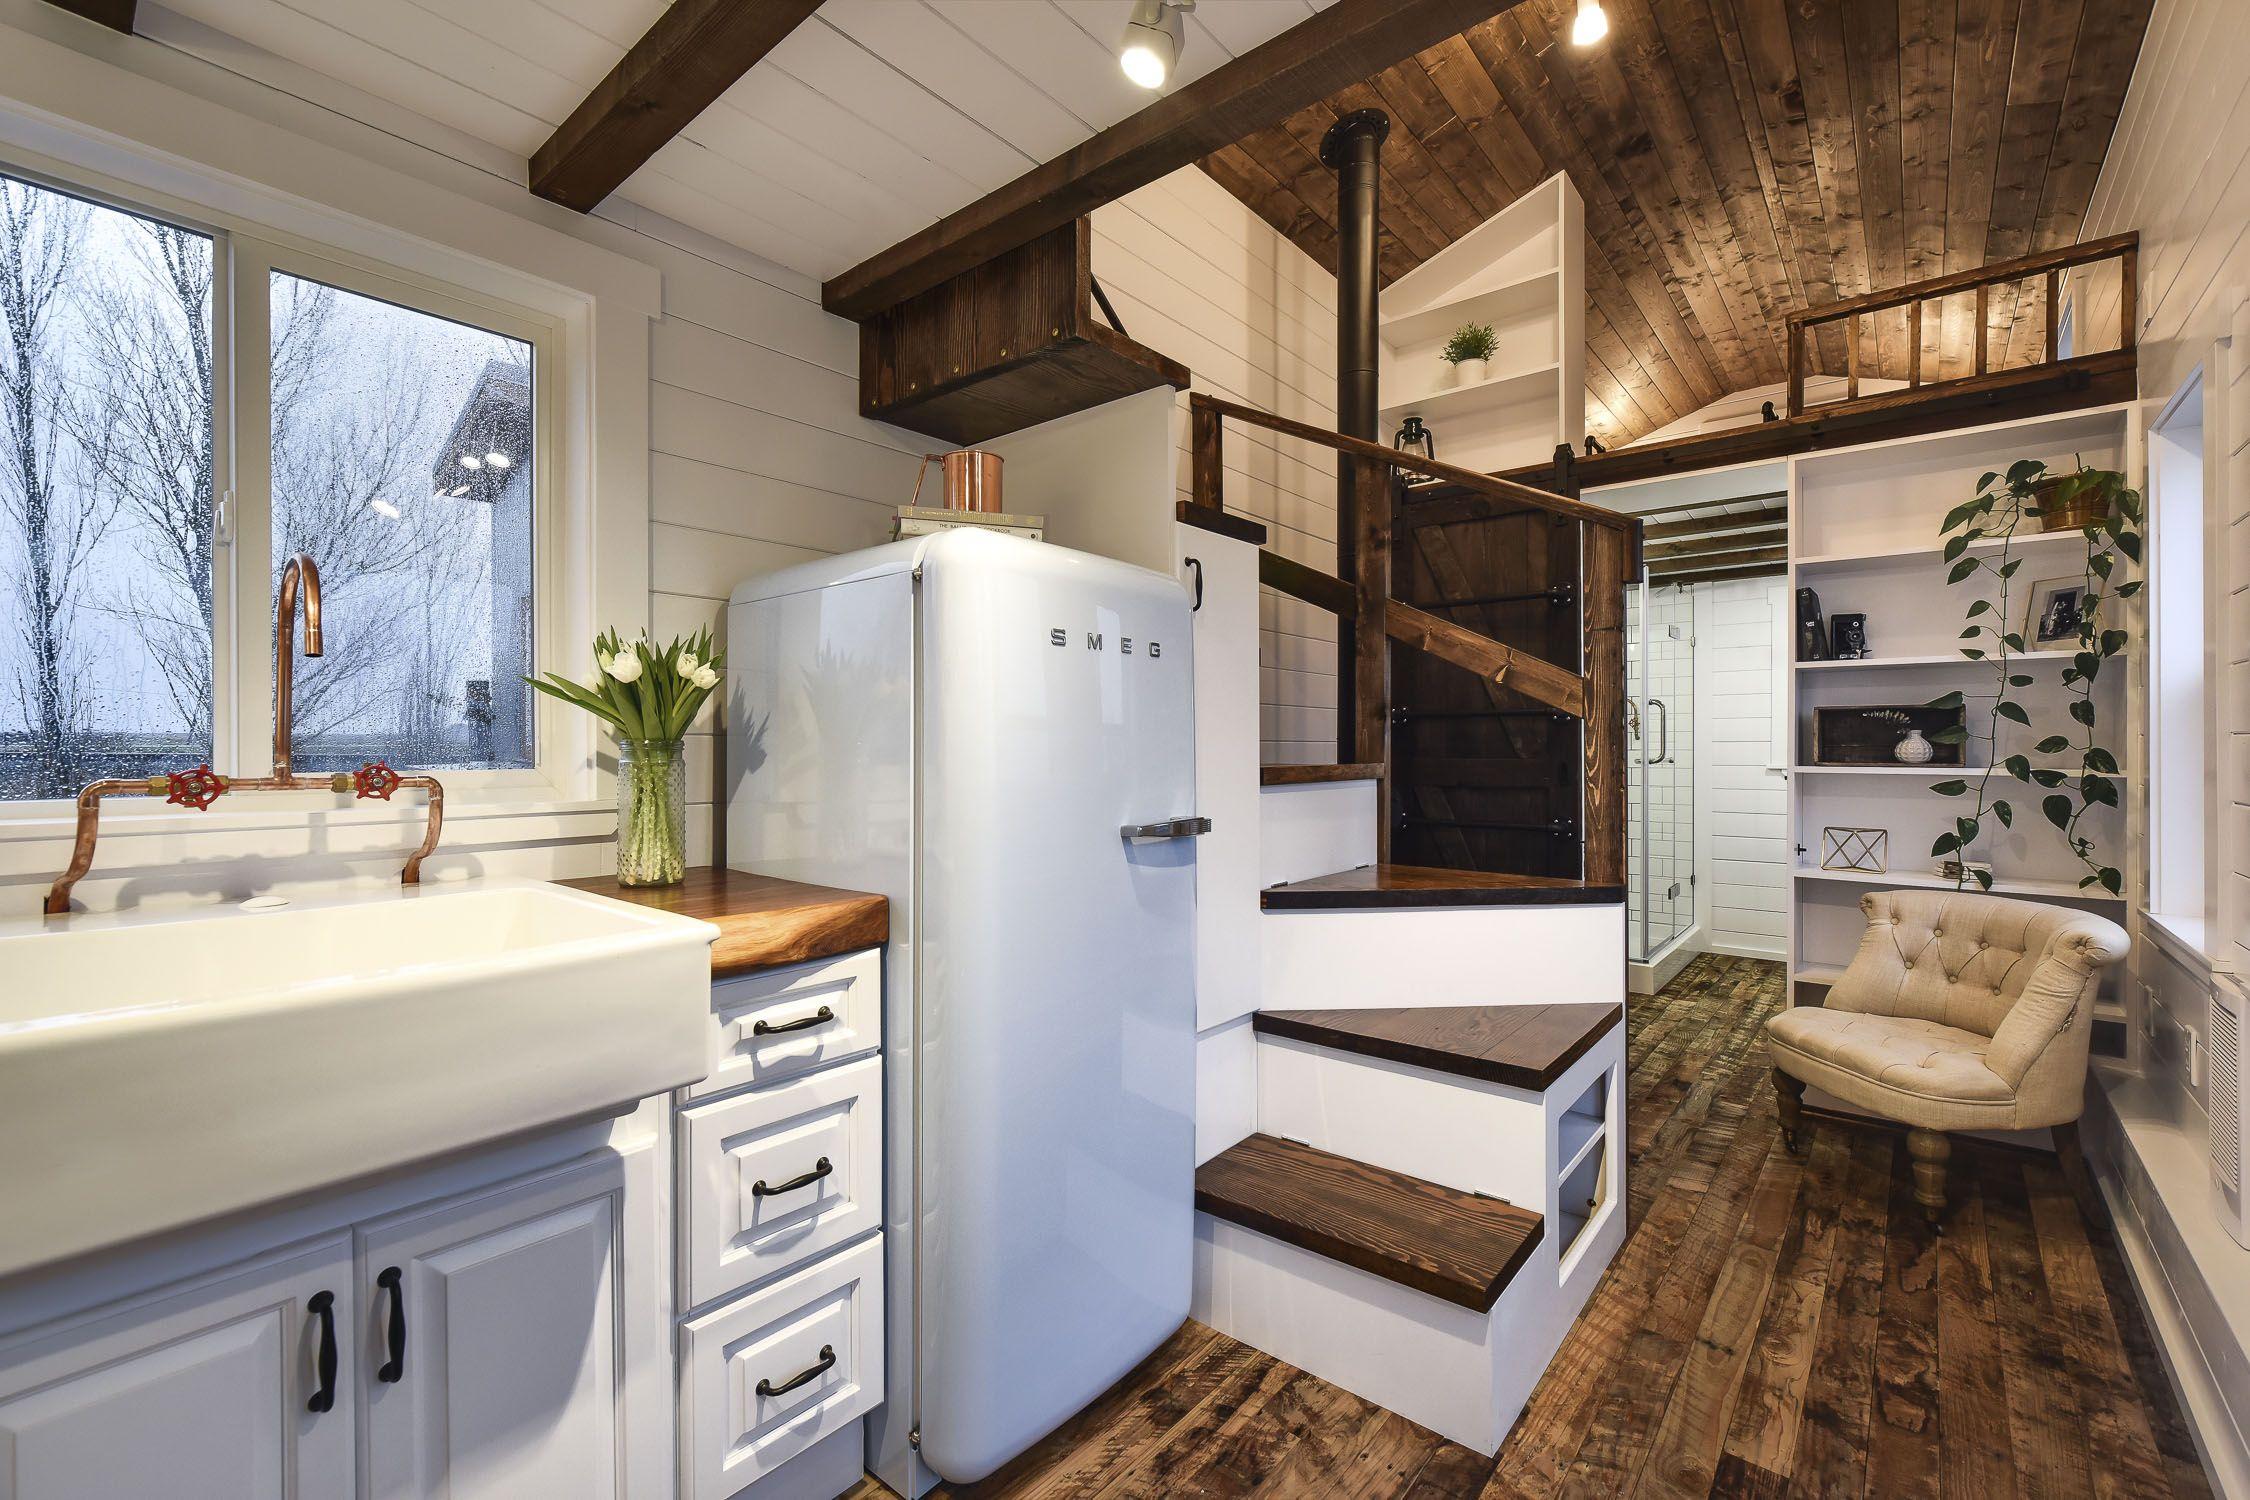 Rustic Loft | Tiny house company, Tiny house listings ...